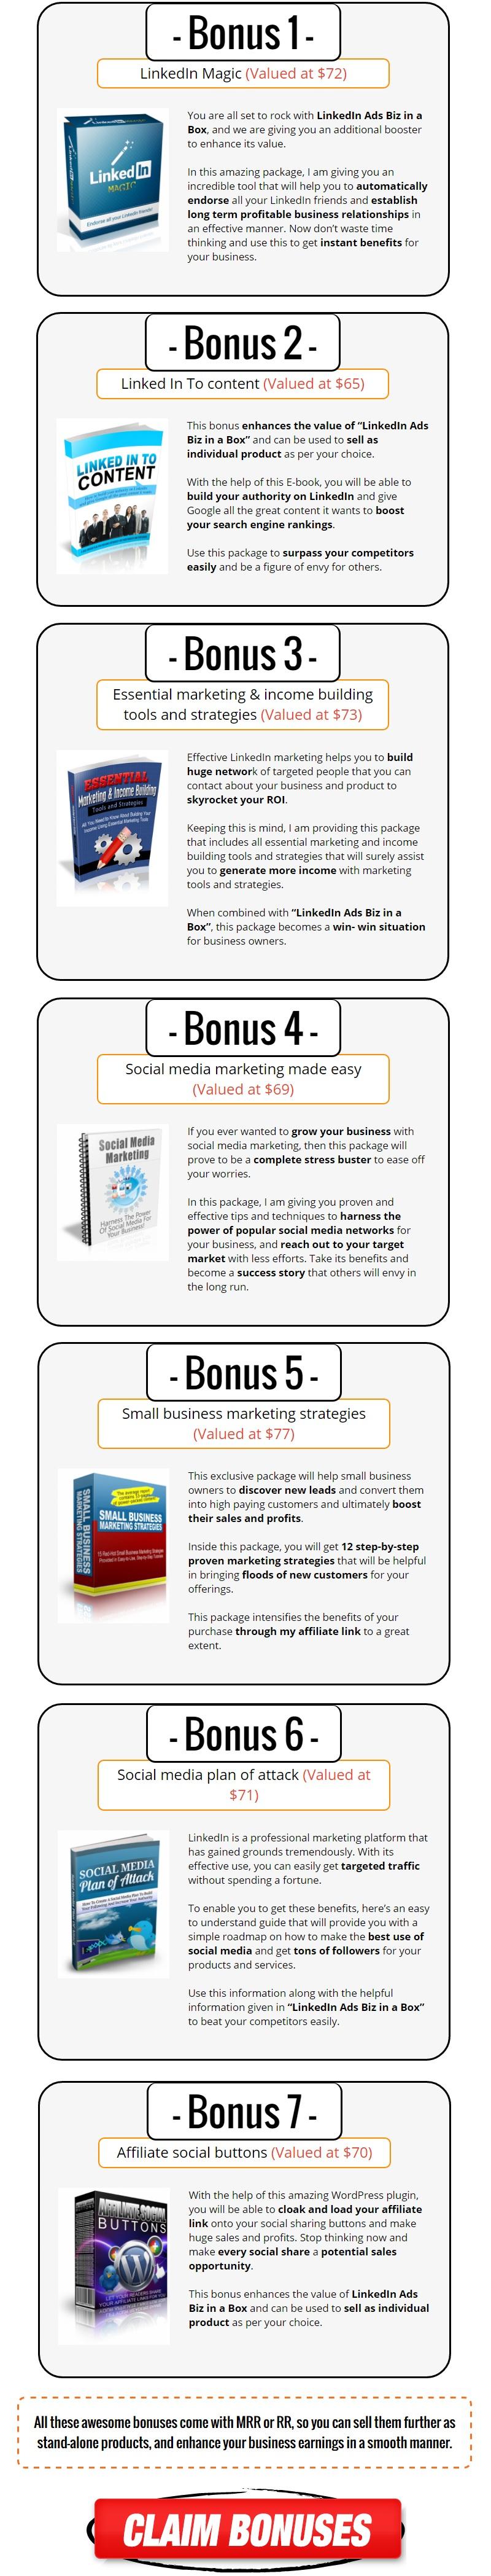 LinkedIn Ads Biz in a Box Bonus